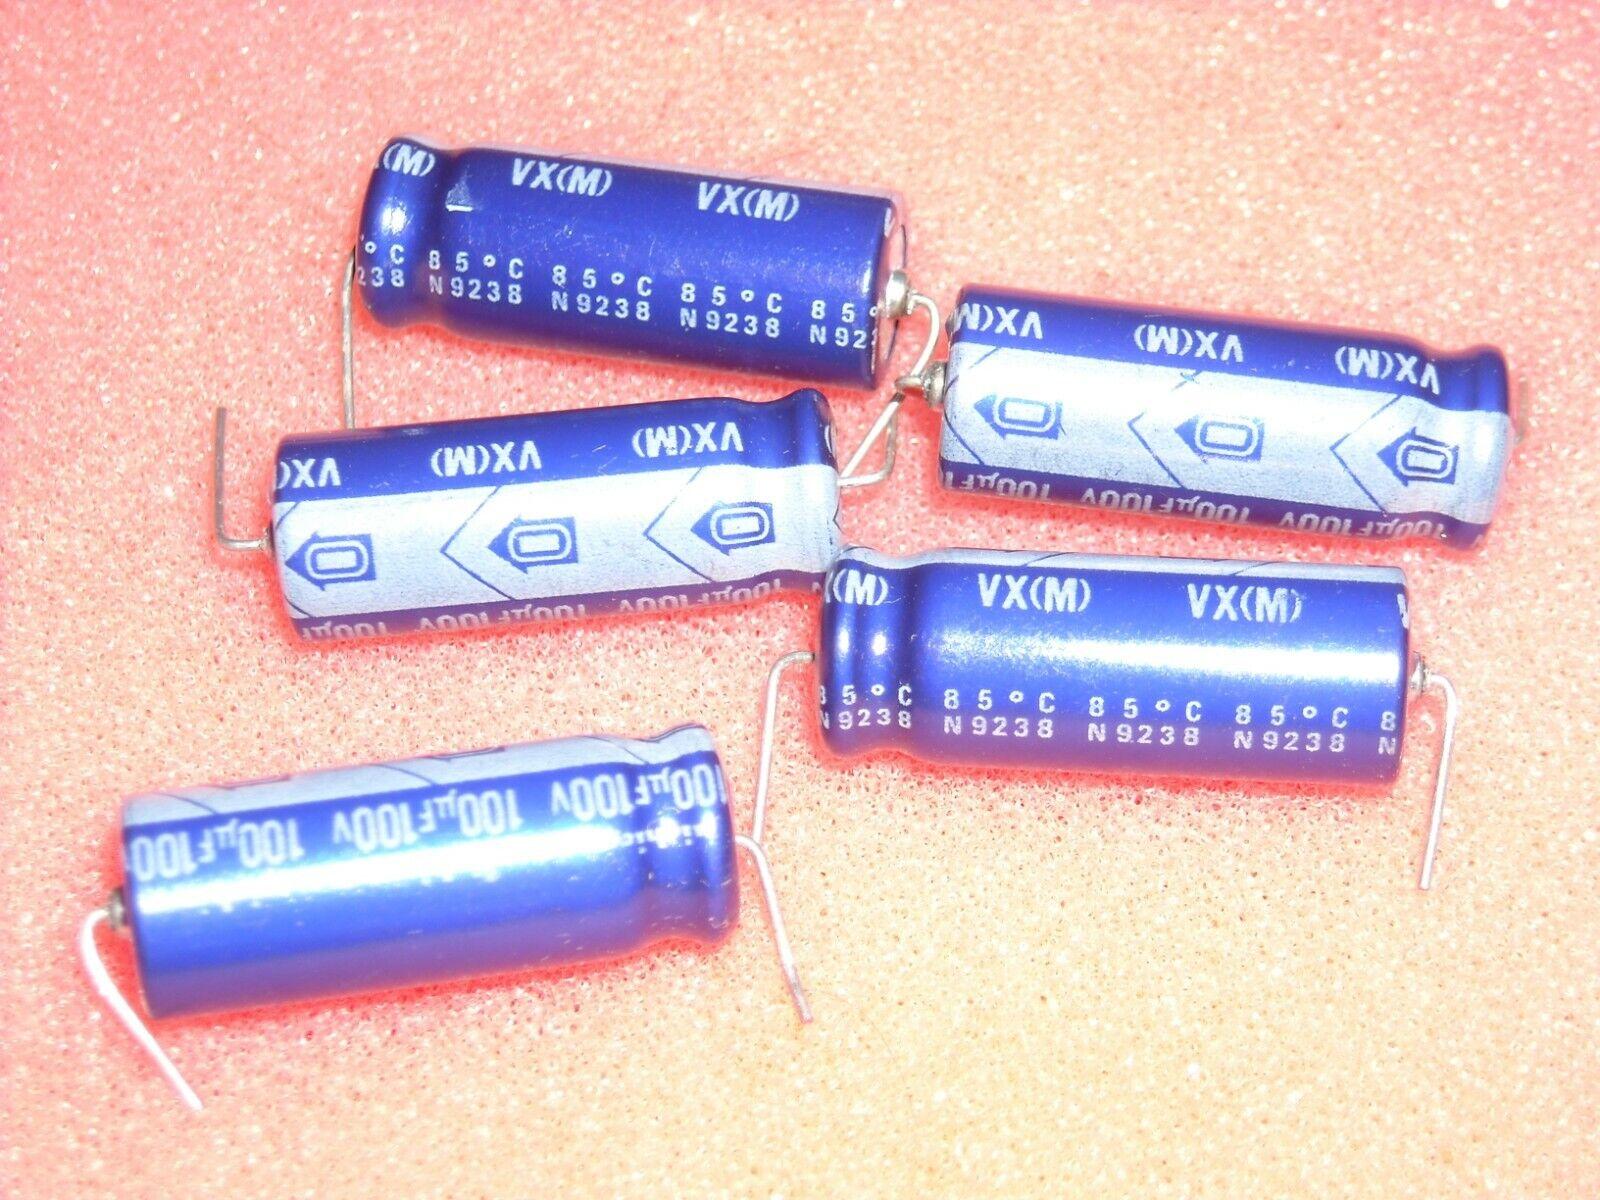 1 pc Nichicon Elko Kondensator axial  TVX2A221MCD  220uF  100V  13x26mm